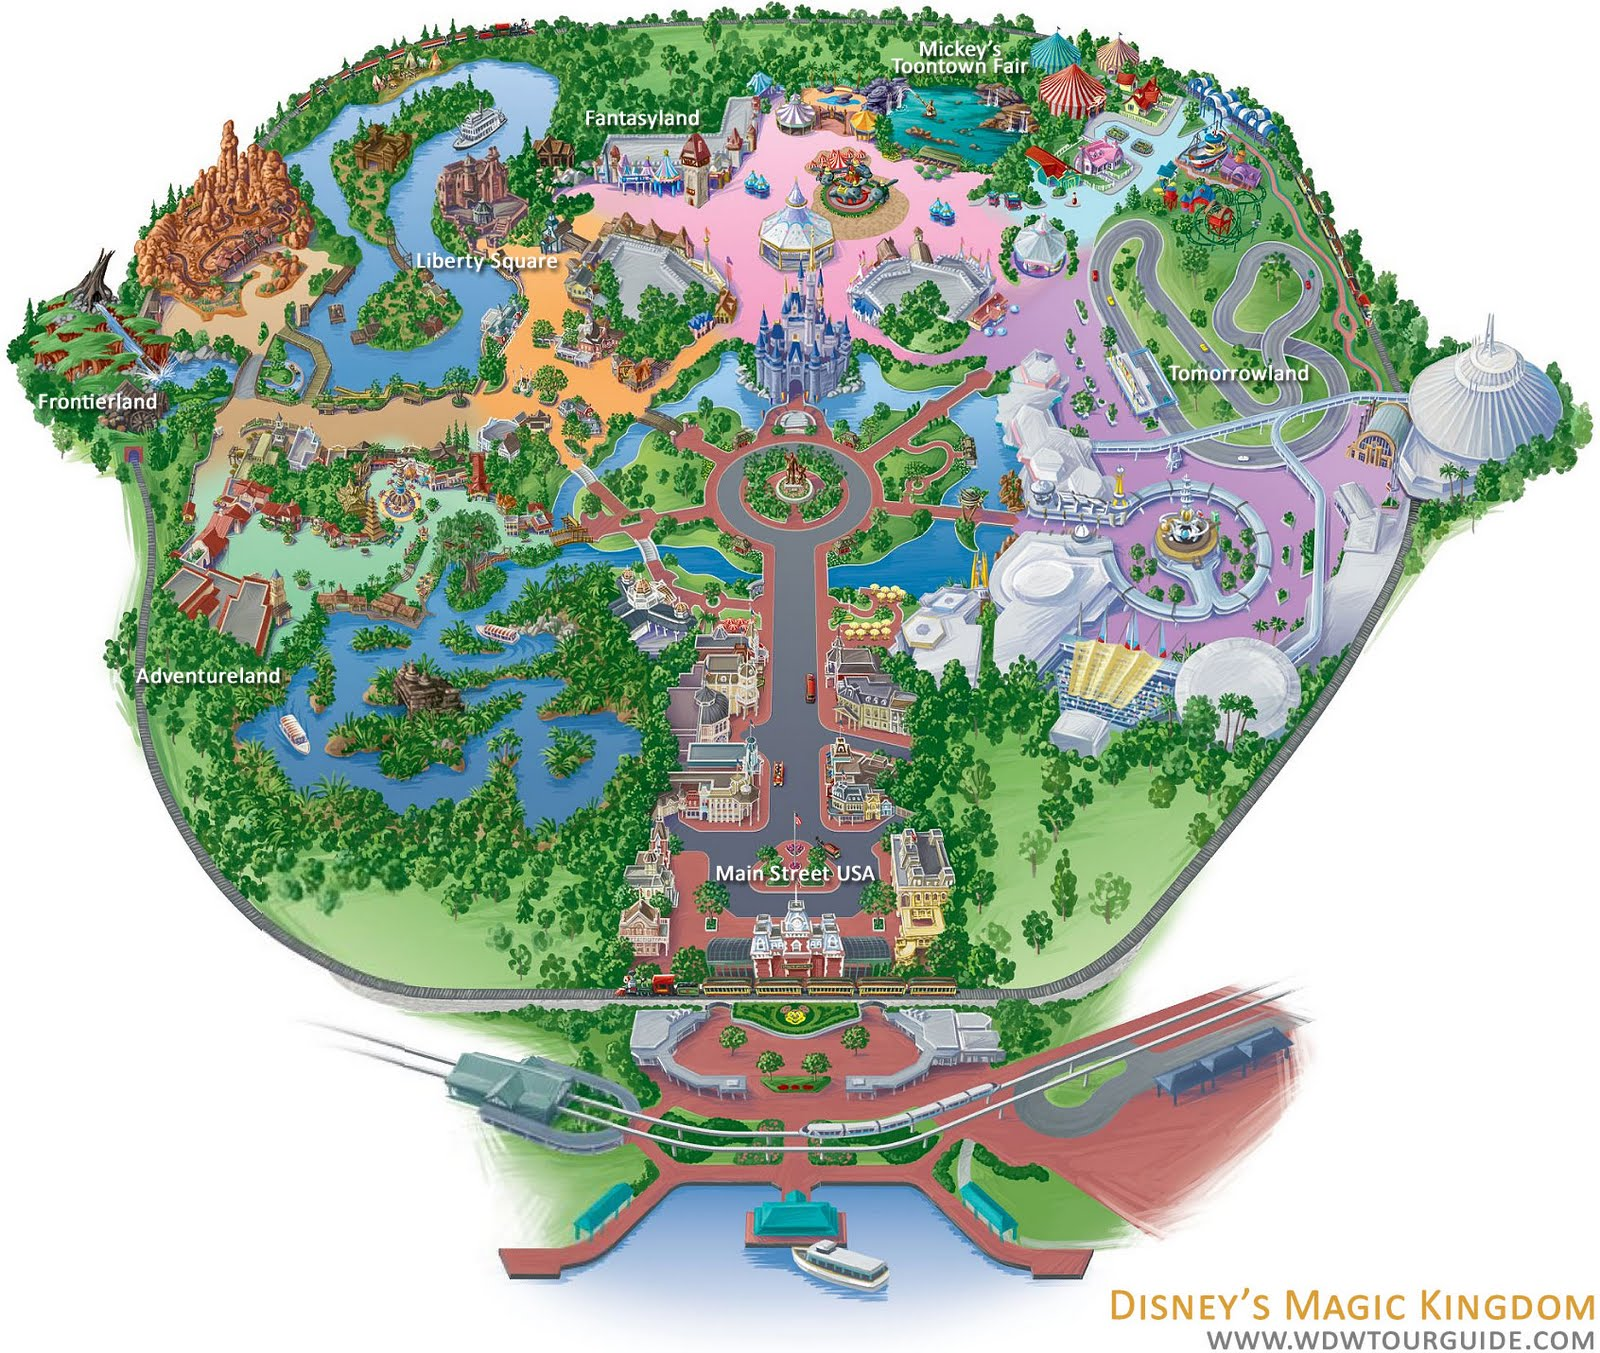 Free Custom Park Maps From Walt Disney